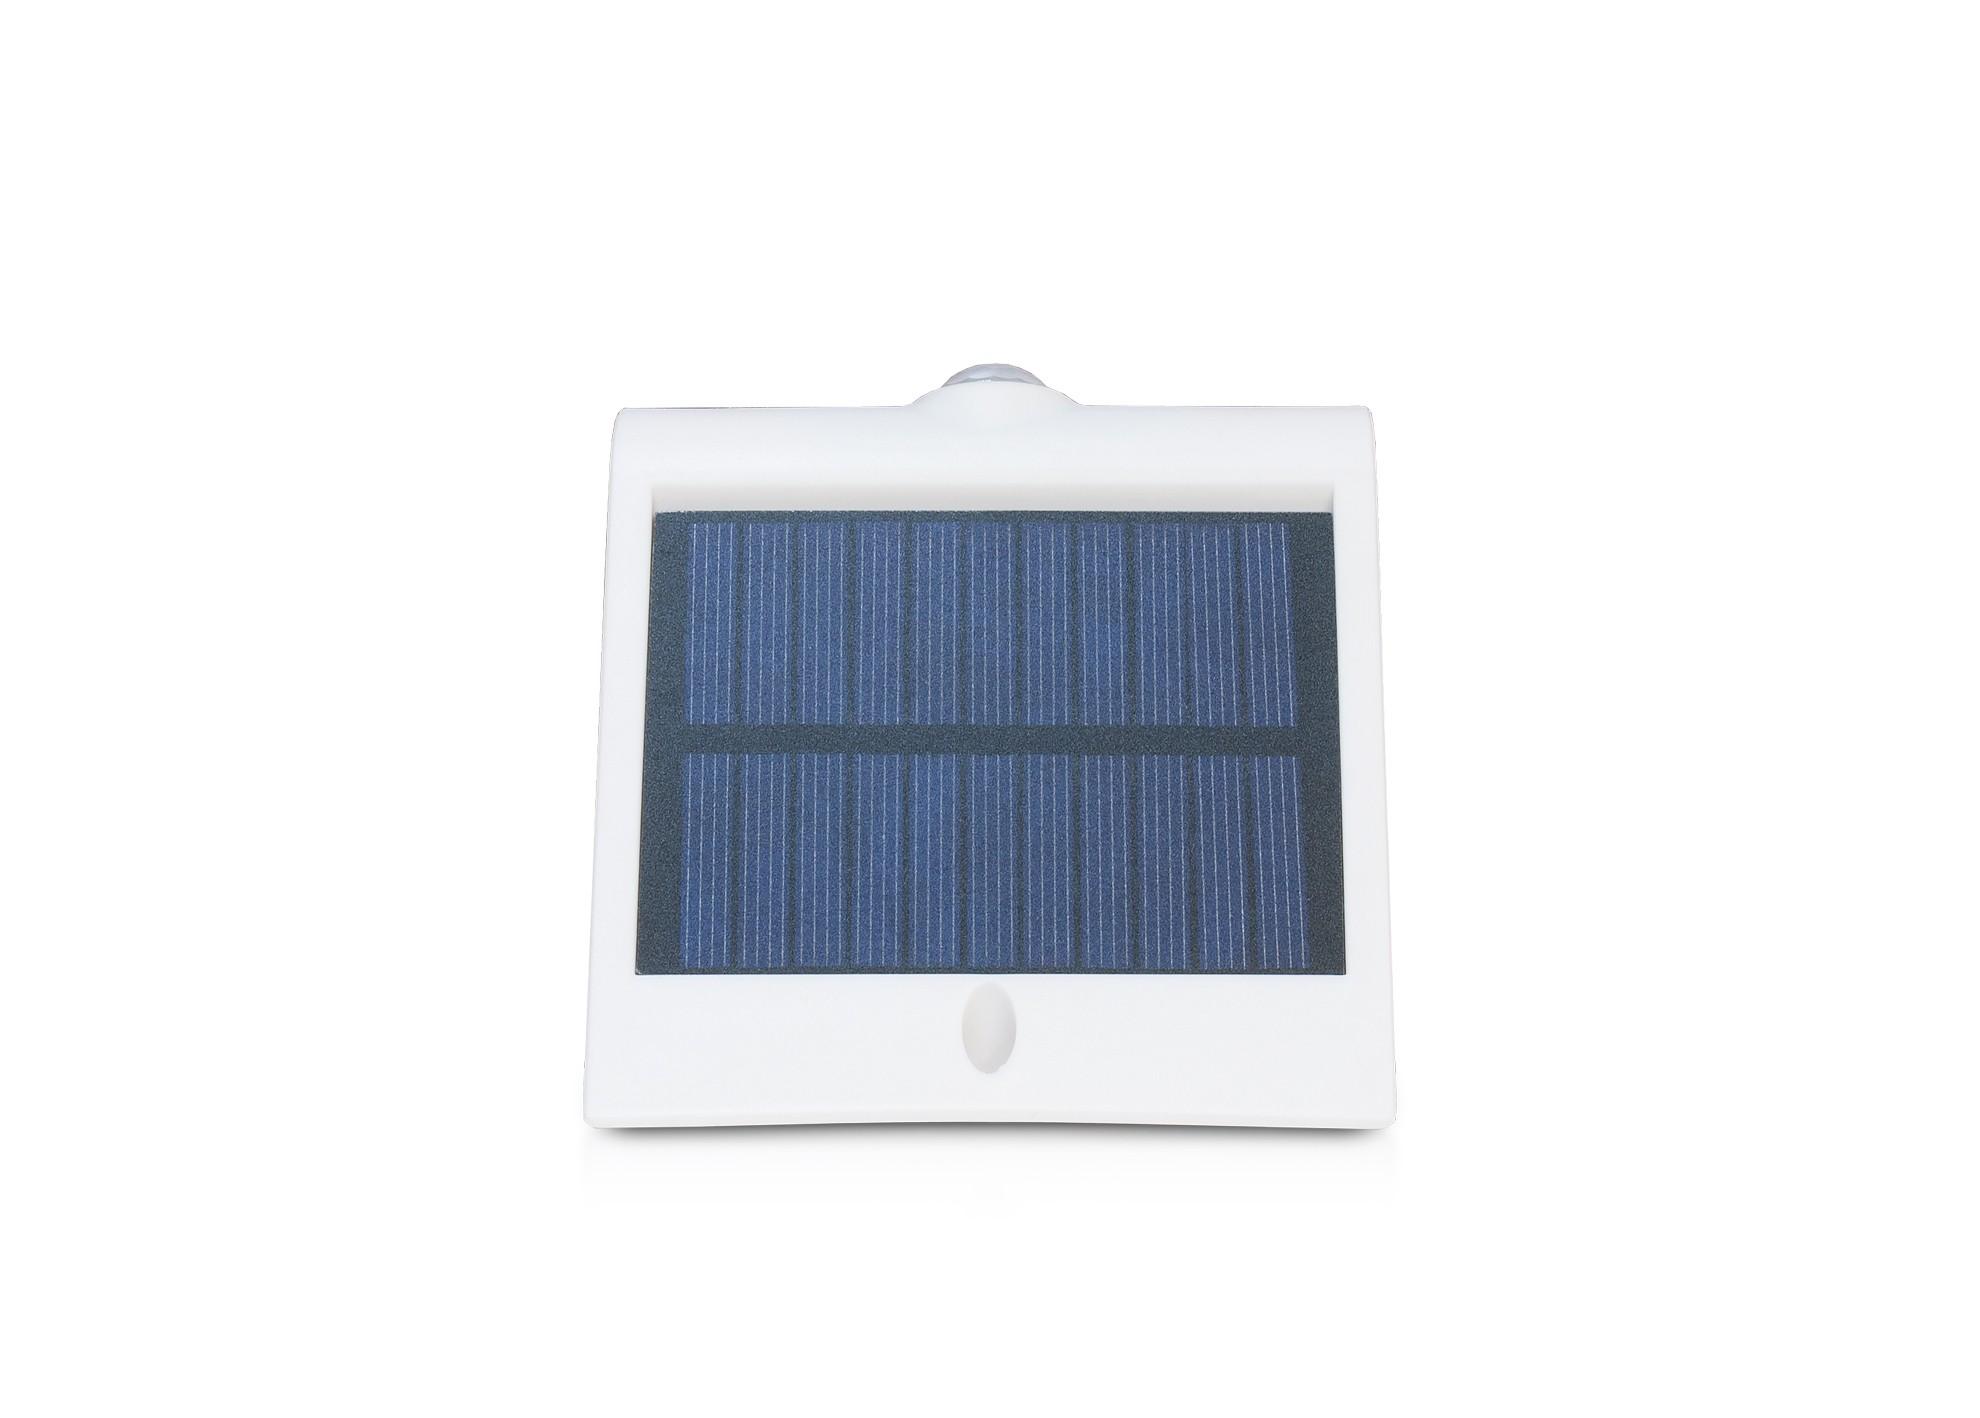 AB LED GV18W solárne svietidlo